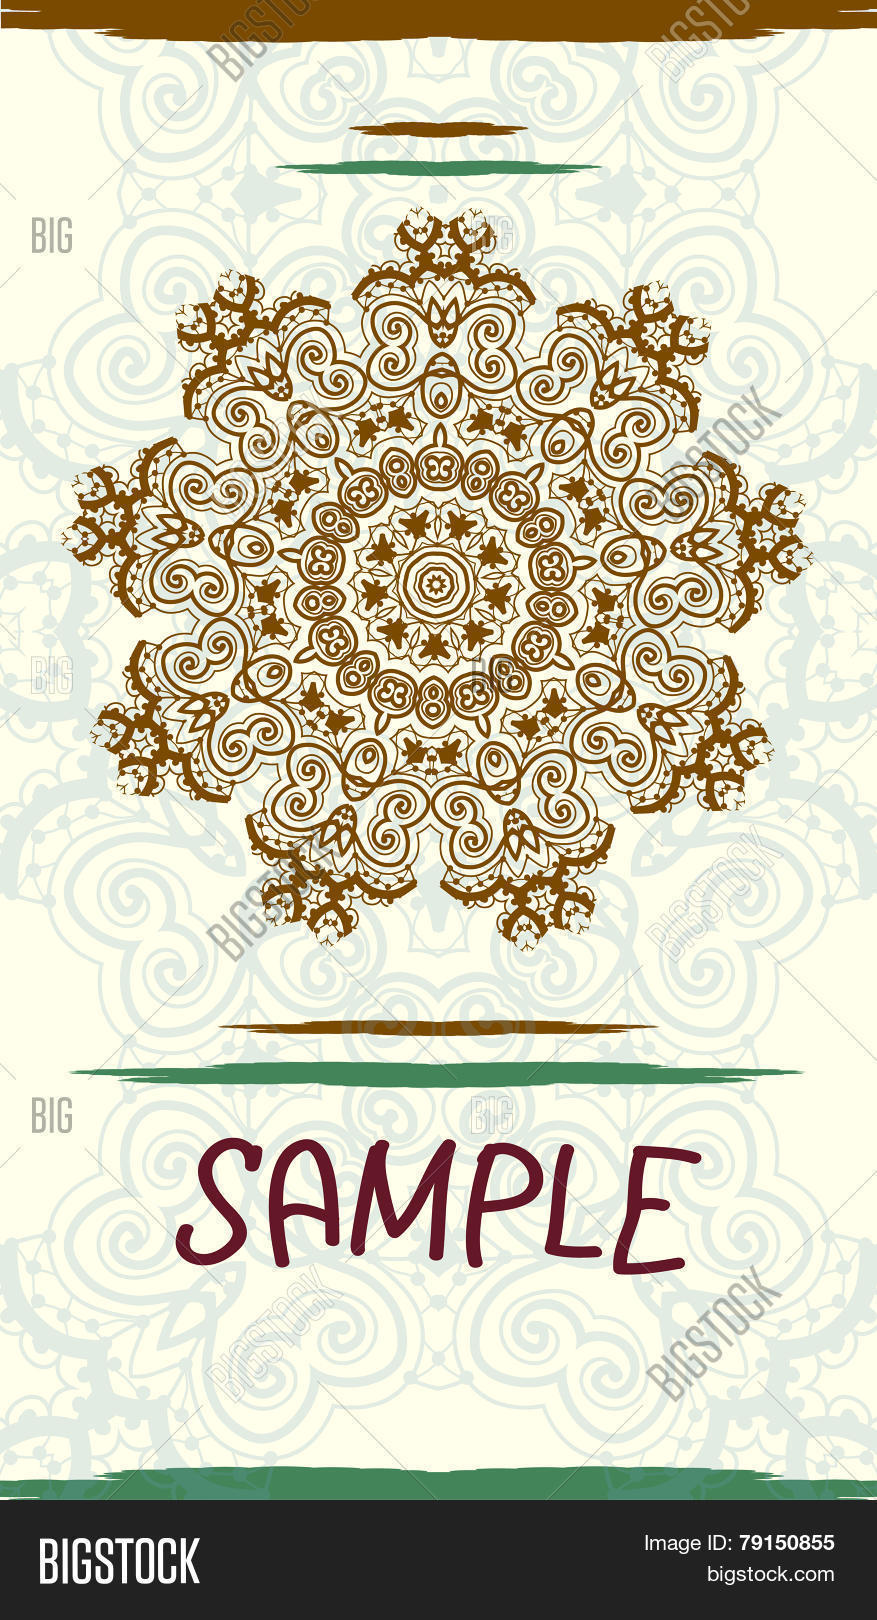 Vertical design vector photo free trial bigstock vertical design wedding invitation card based on traditional tribal mehndi henna art vintage decora stopboris Images